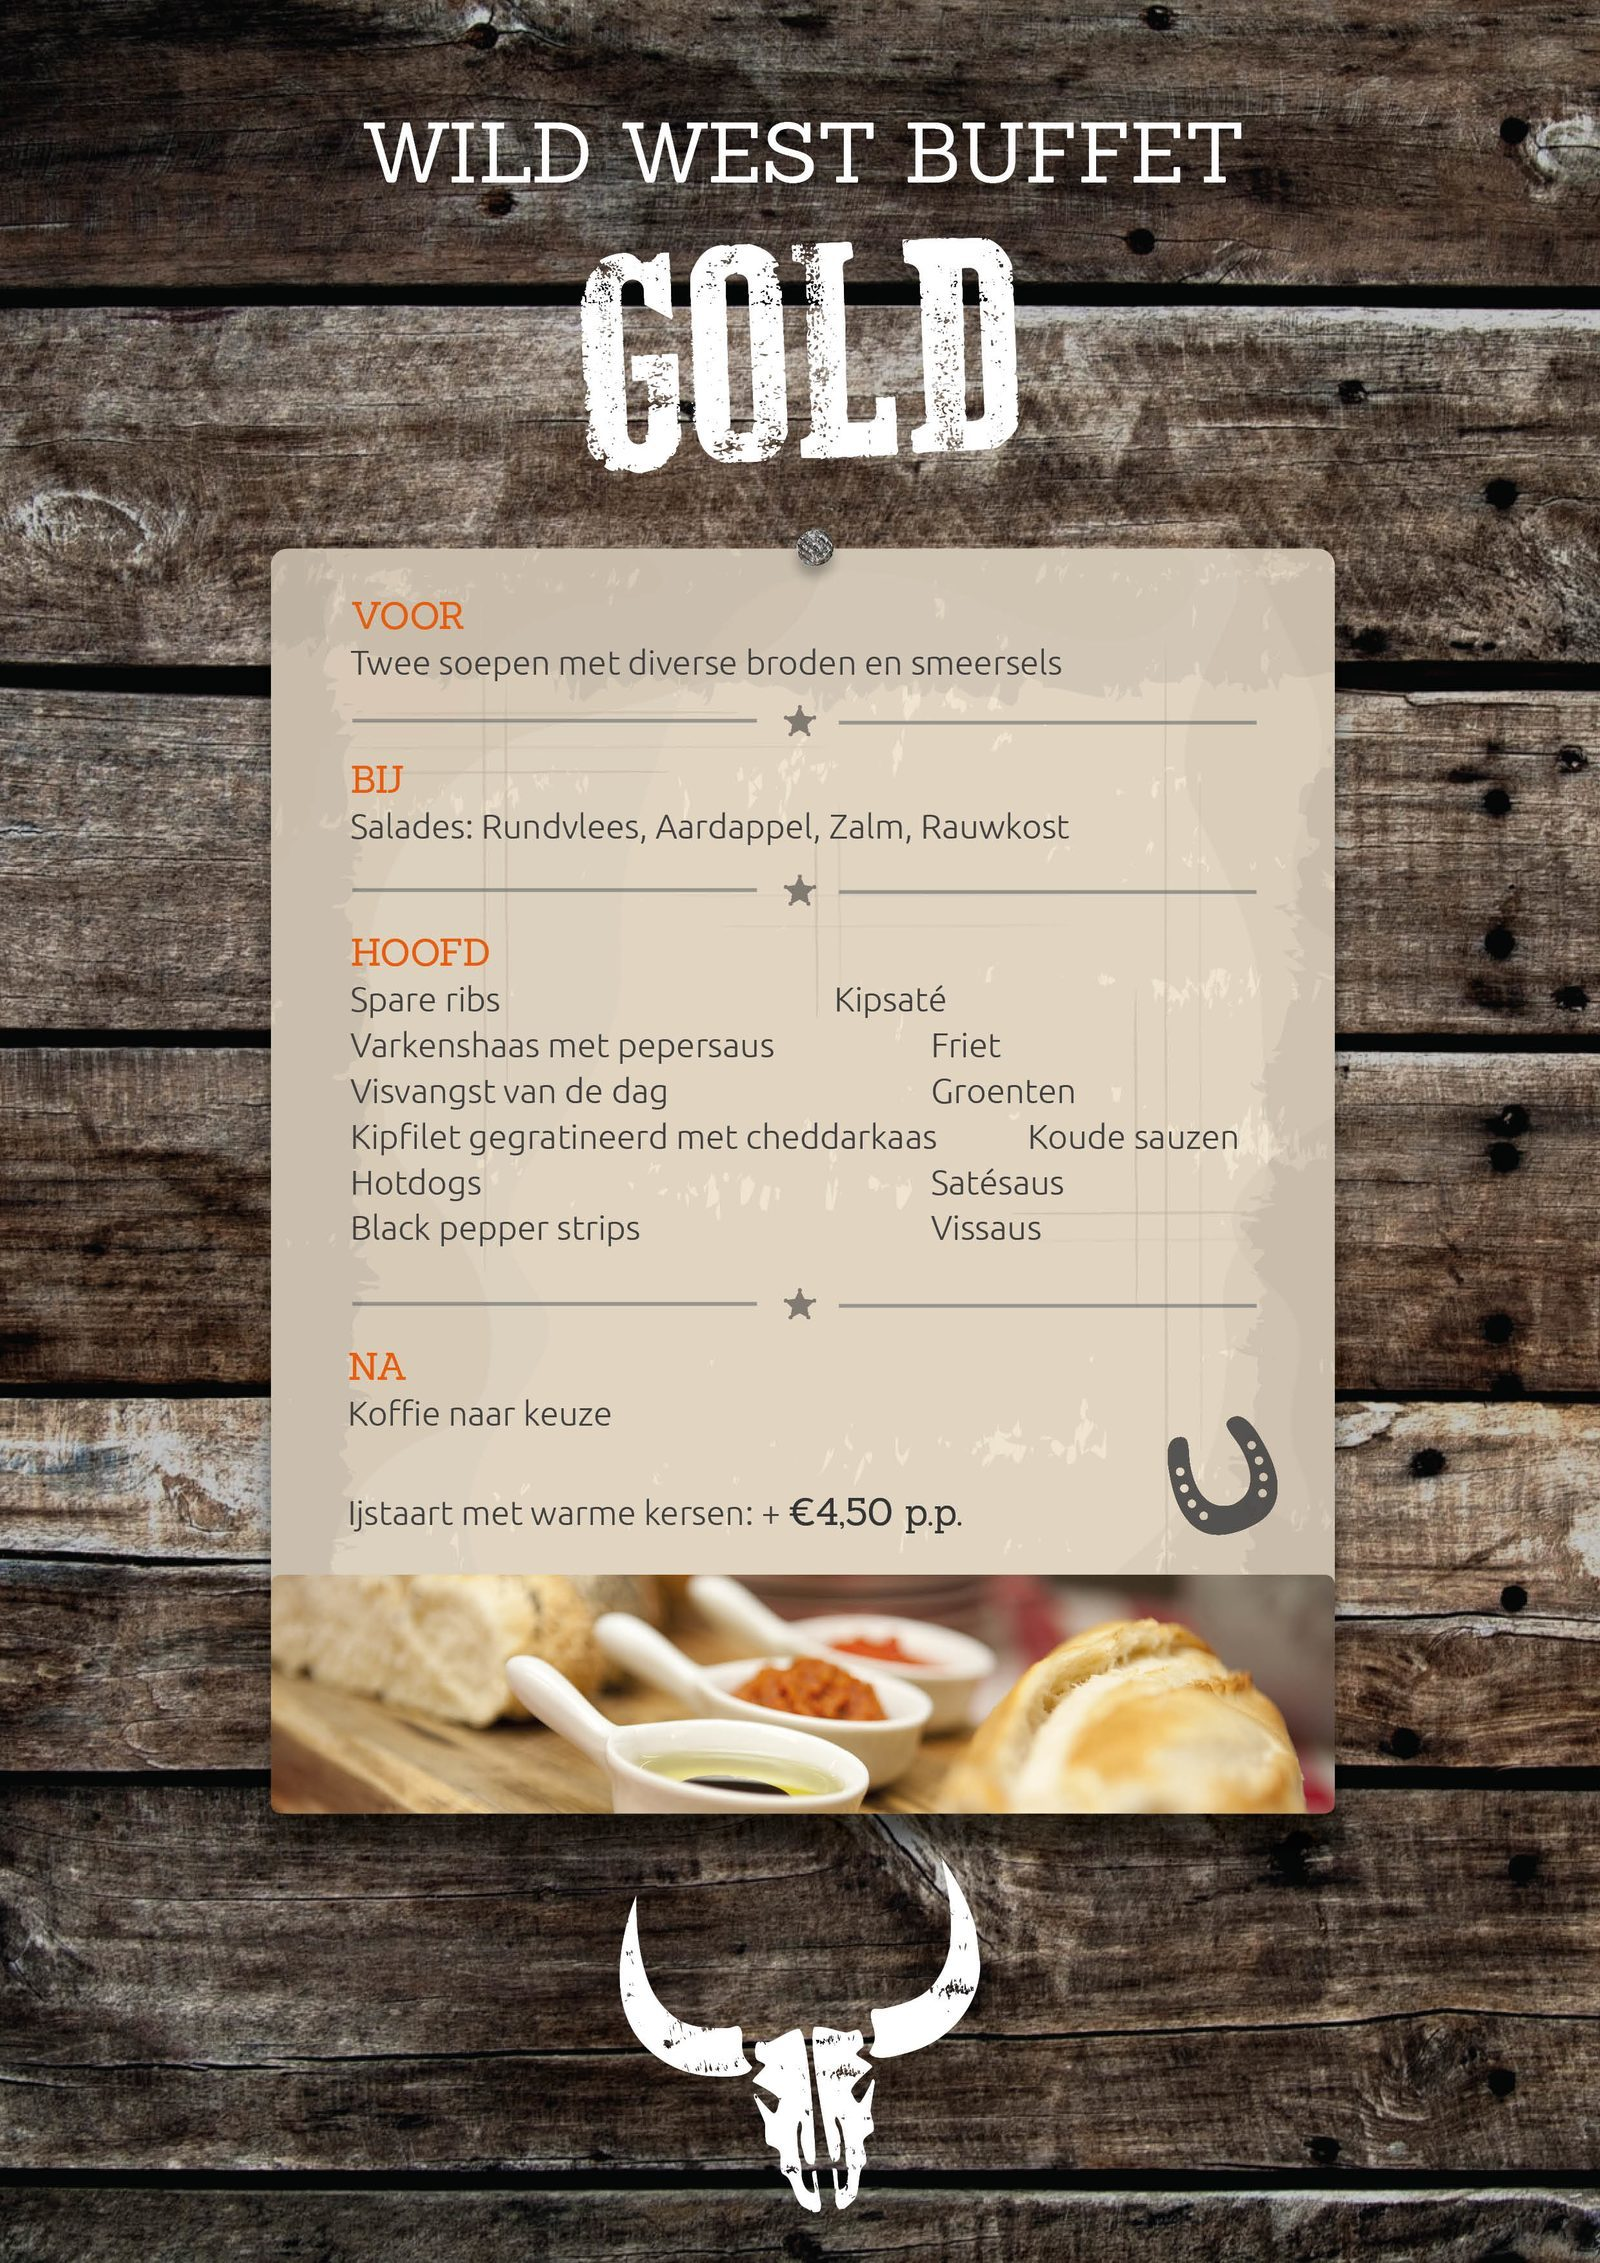 Luxe Wild West Gold buffet in Voorthuizen